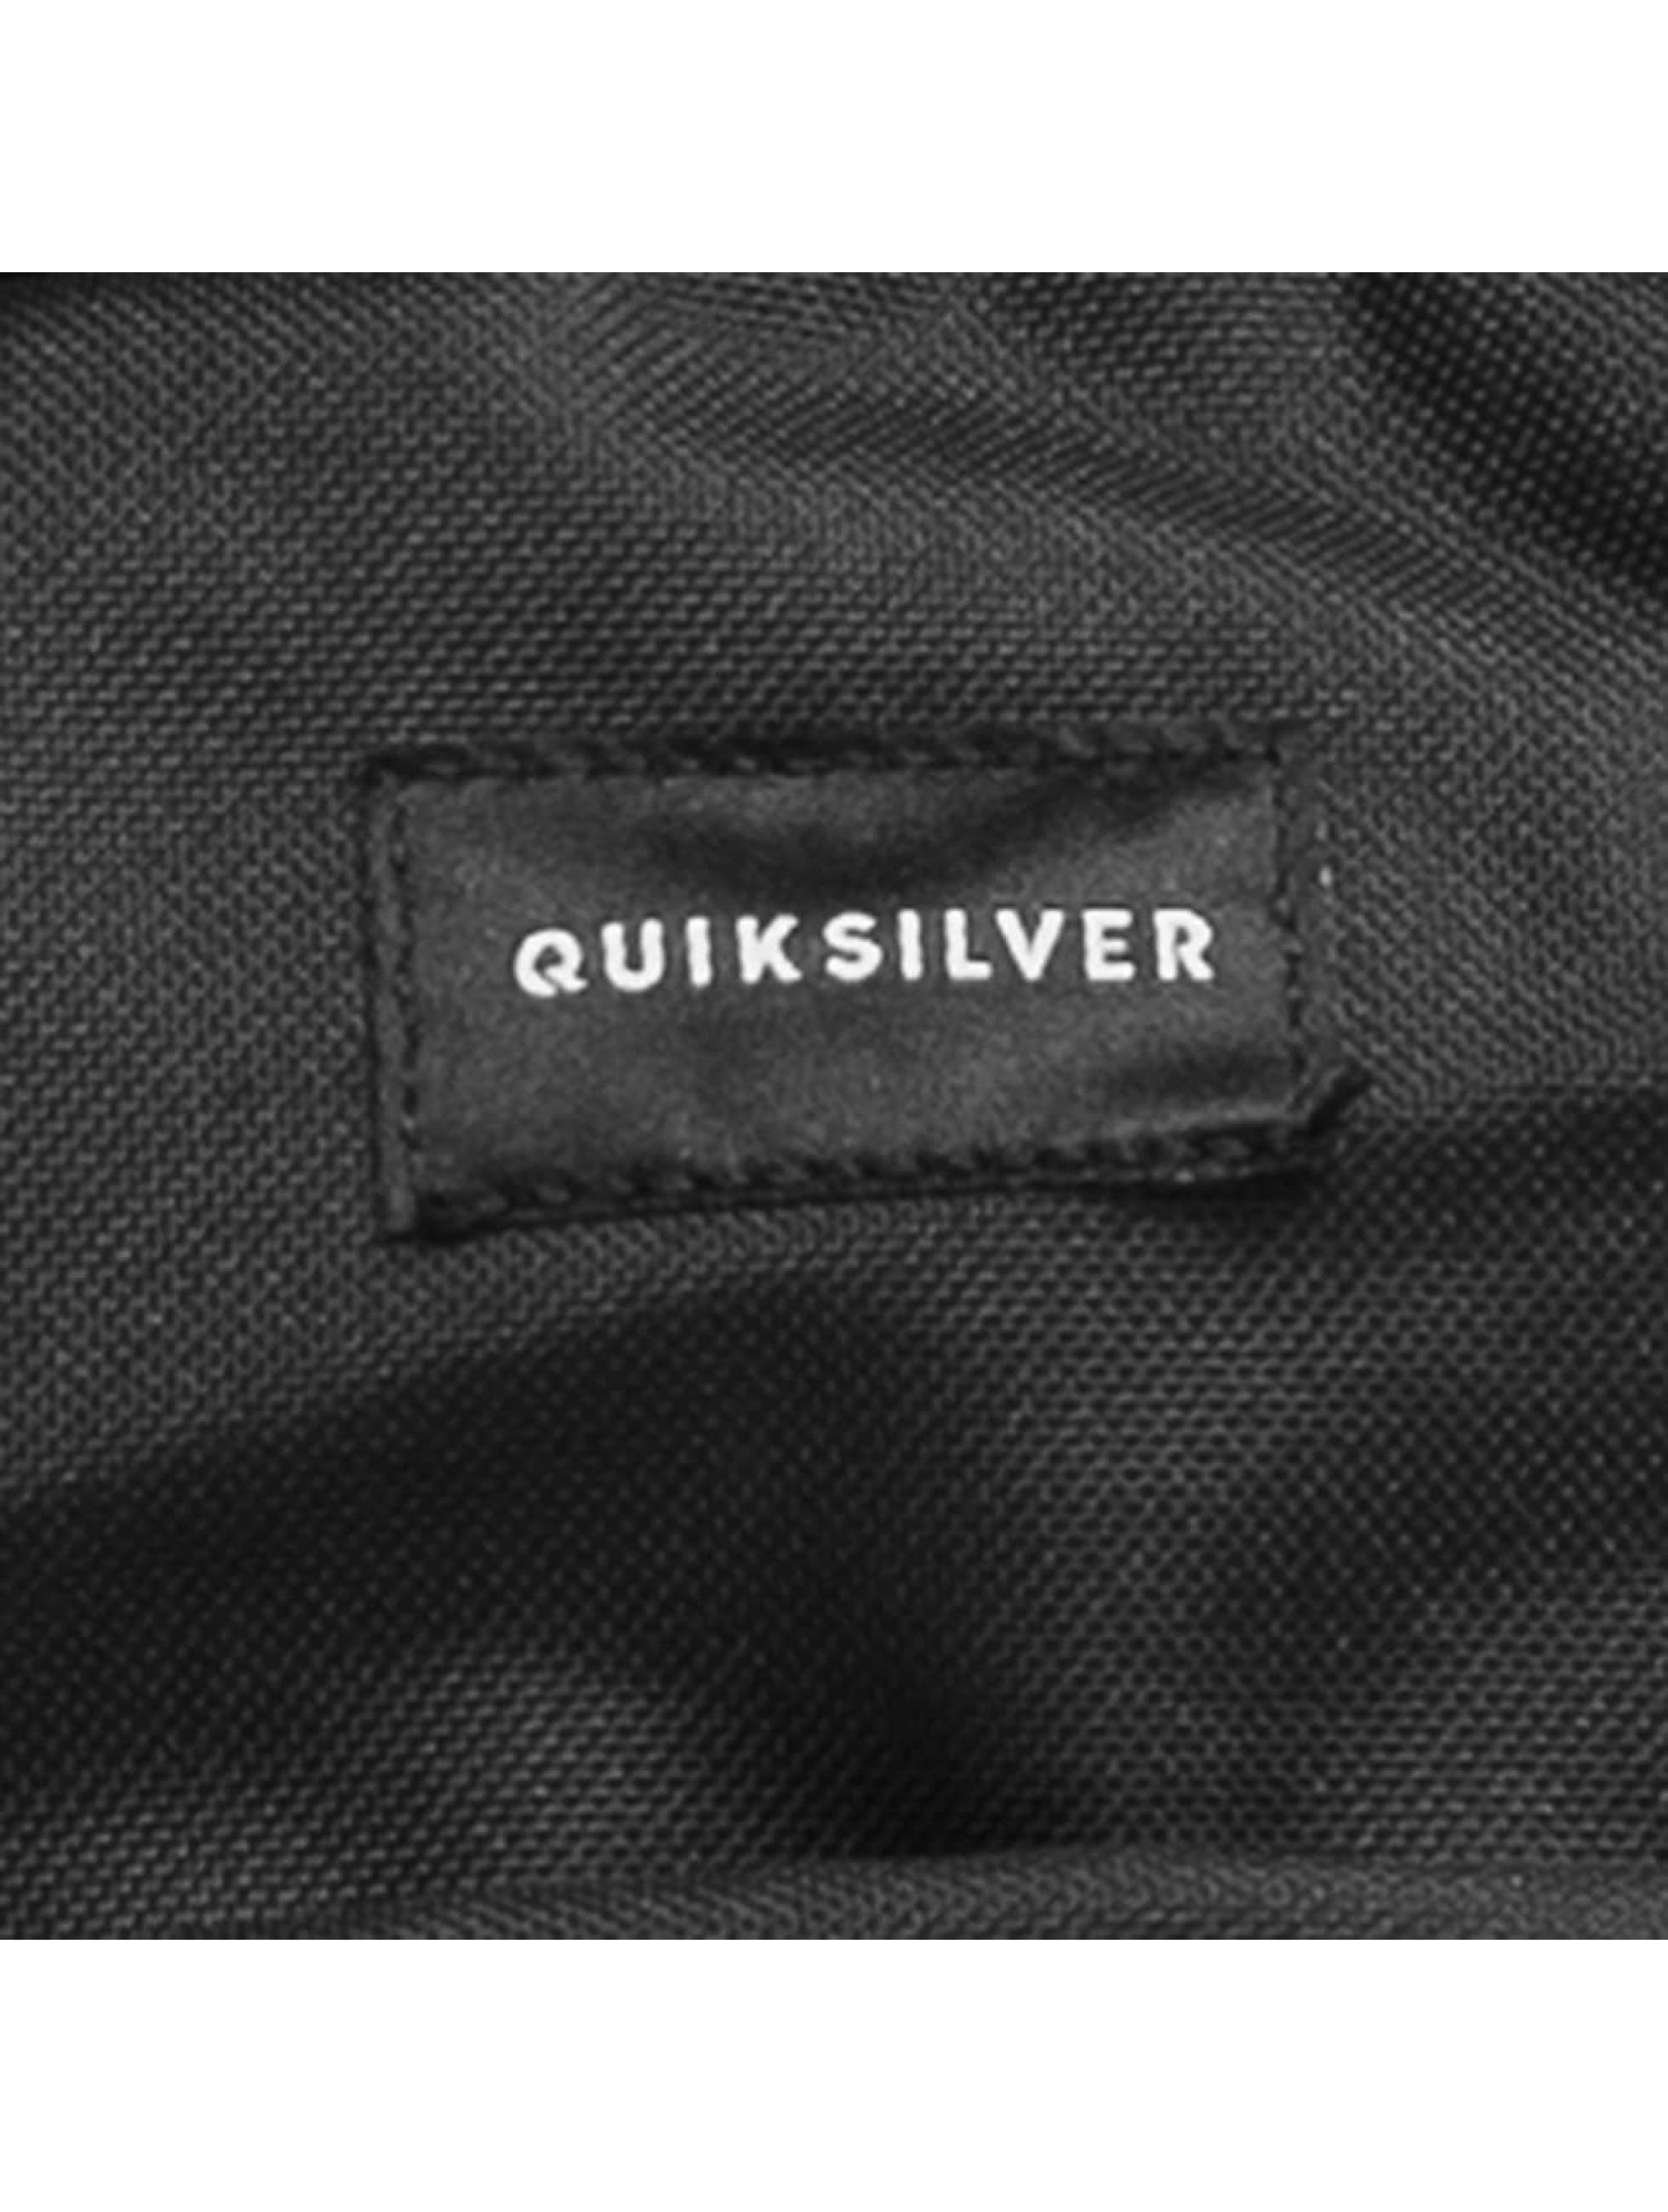 Quiksilver Mochila Burst negro